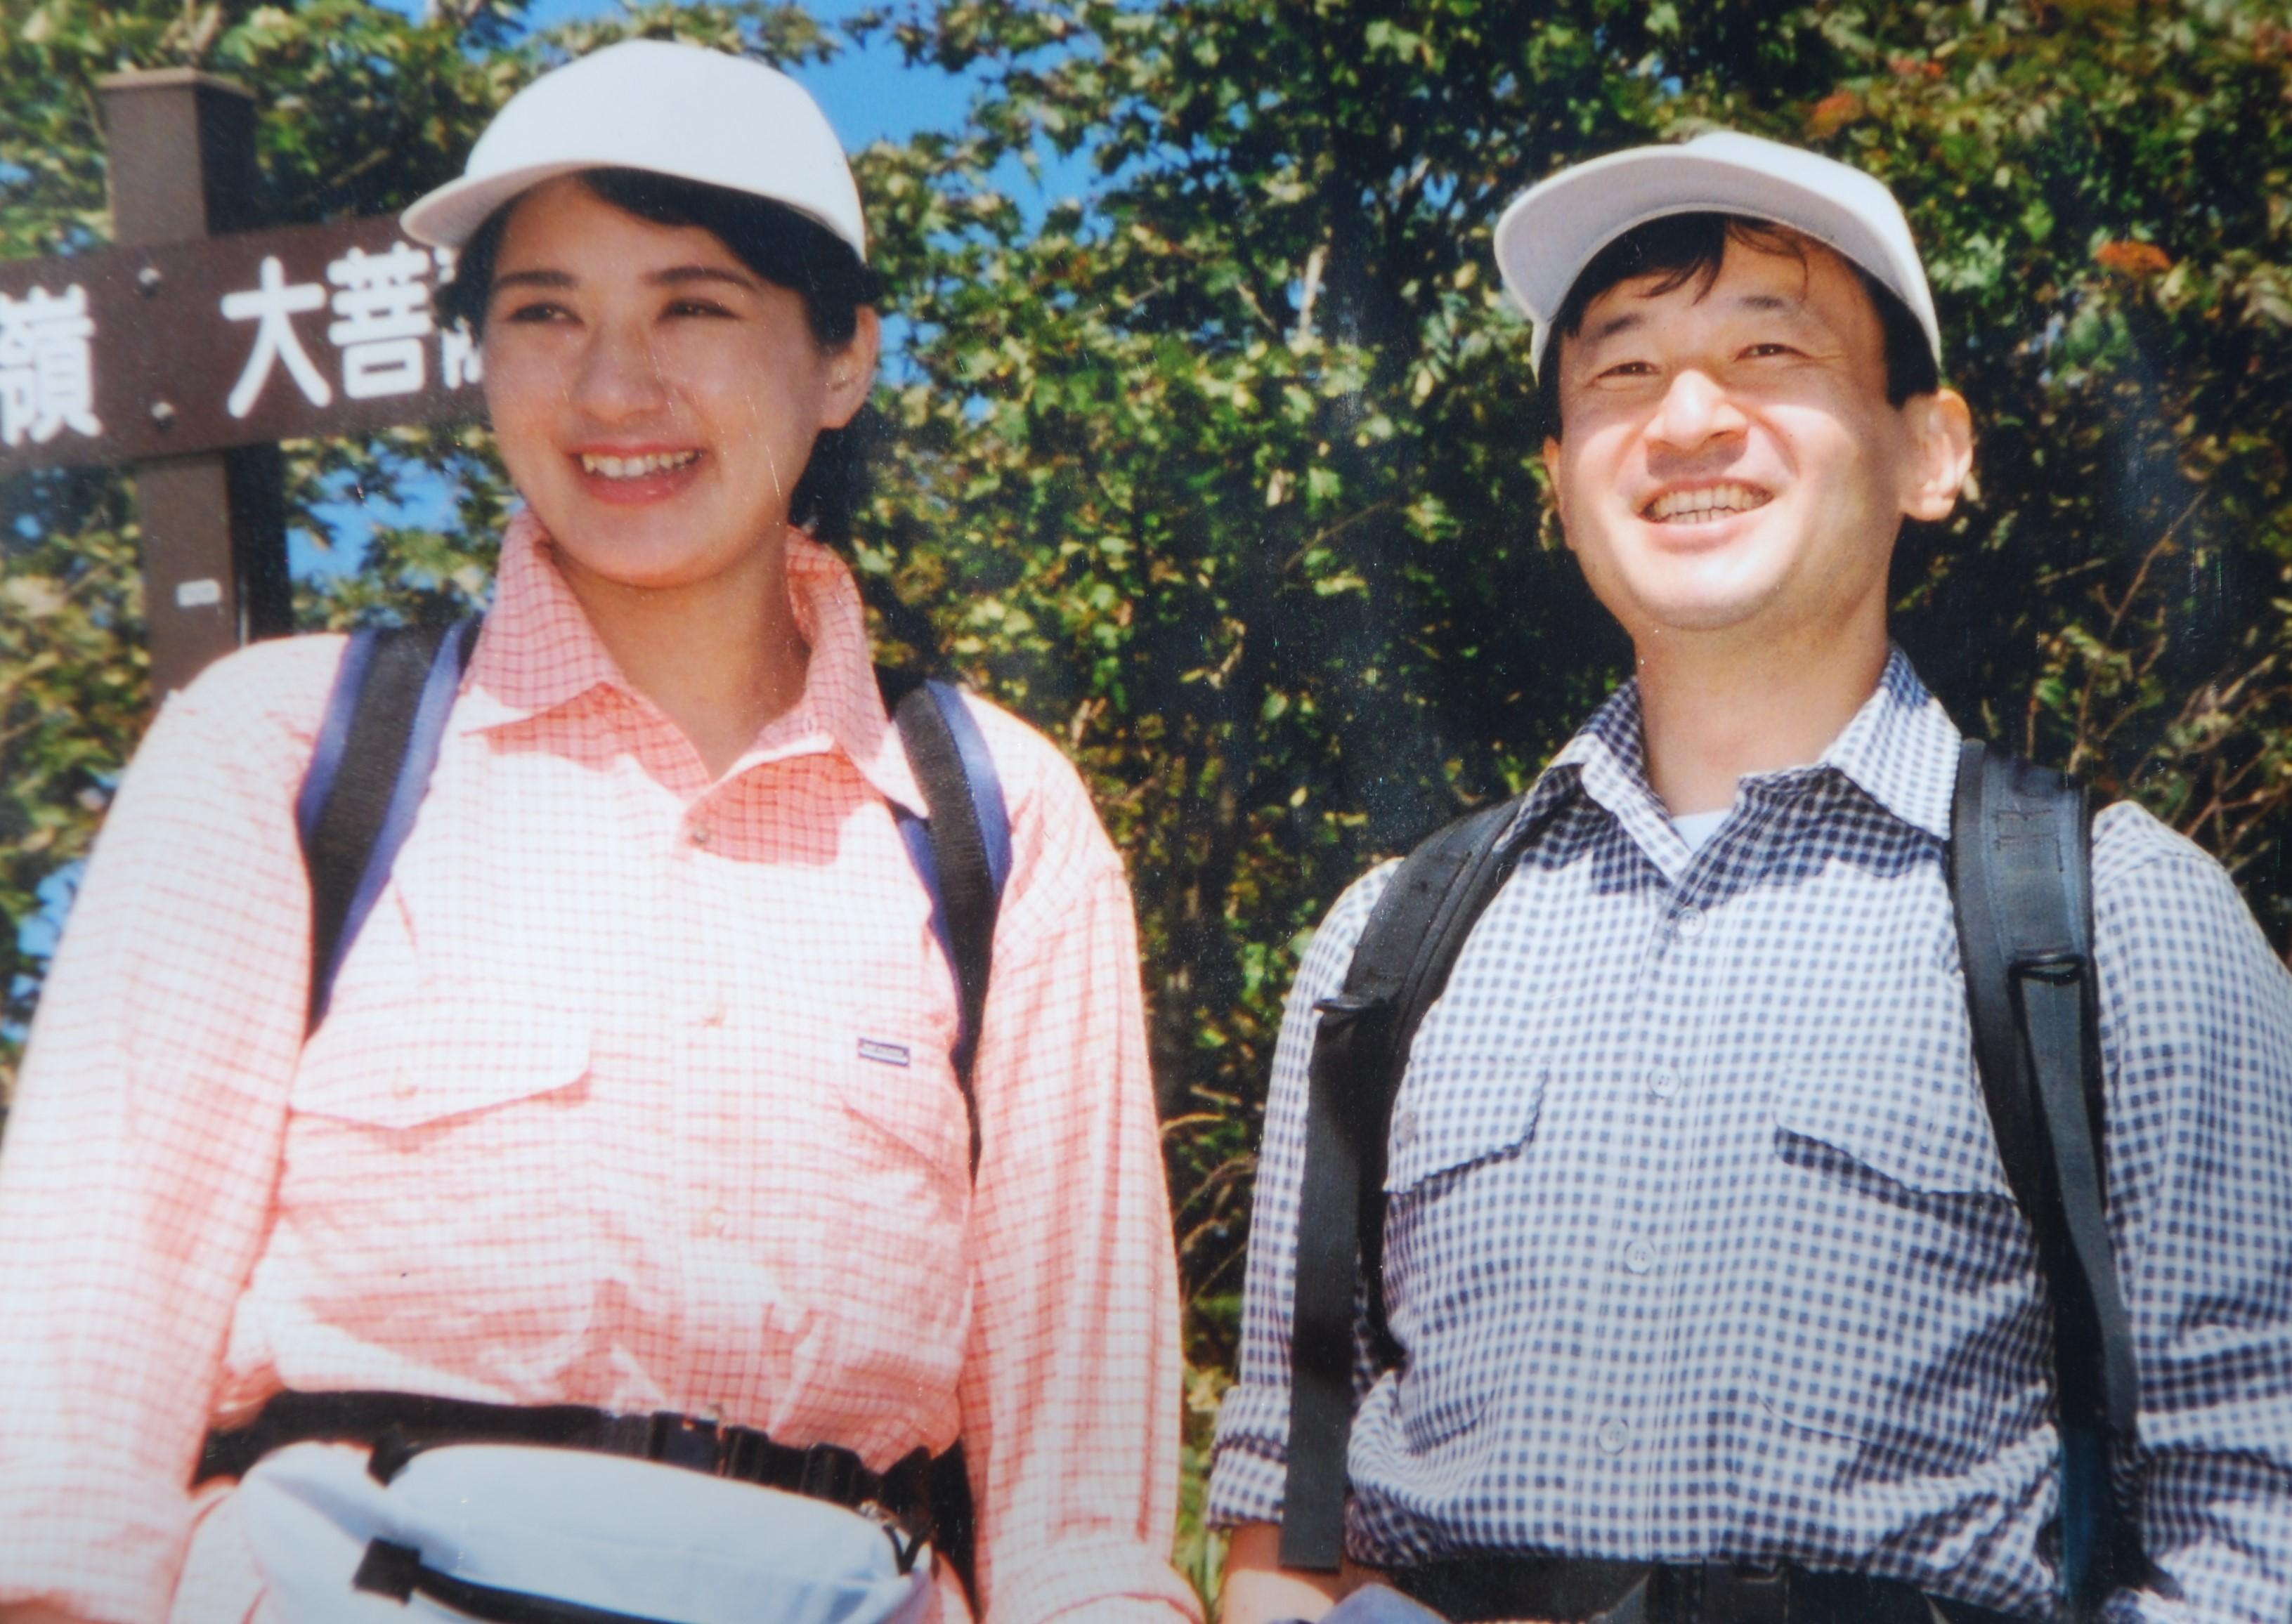 大菩薩嶺での天皇、皇后両陛下=2002年、9月